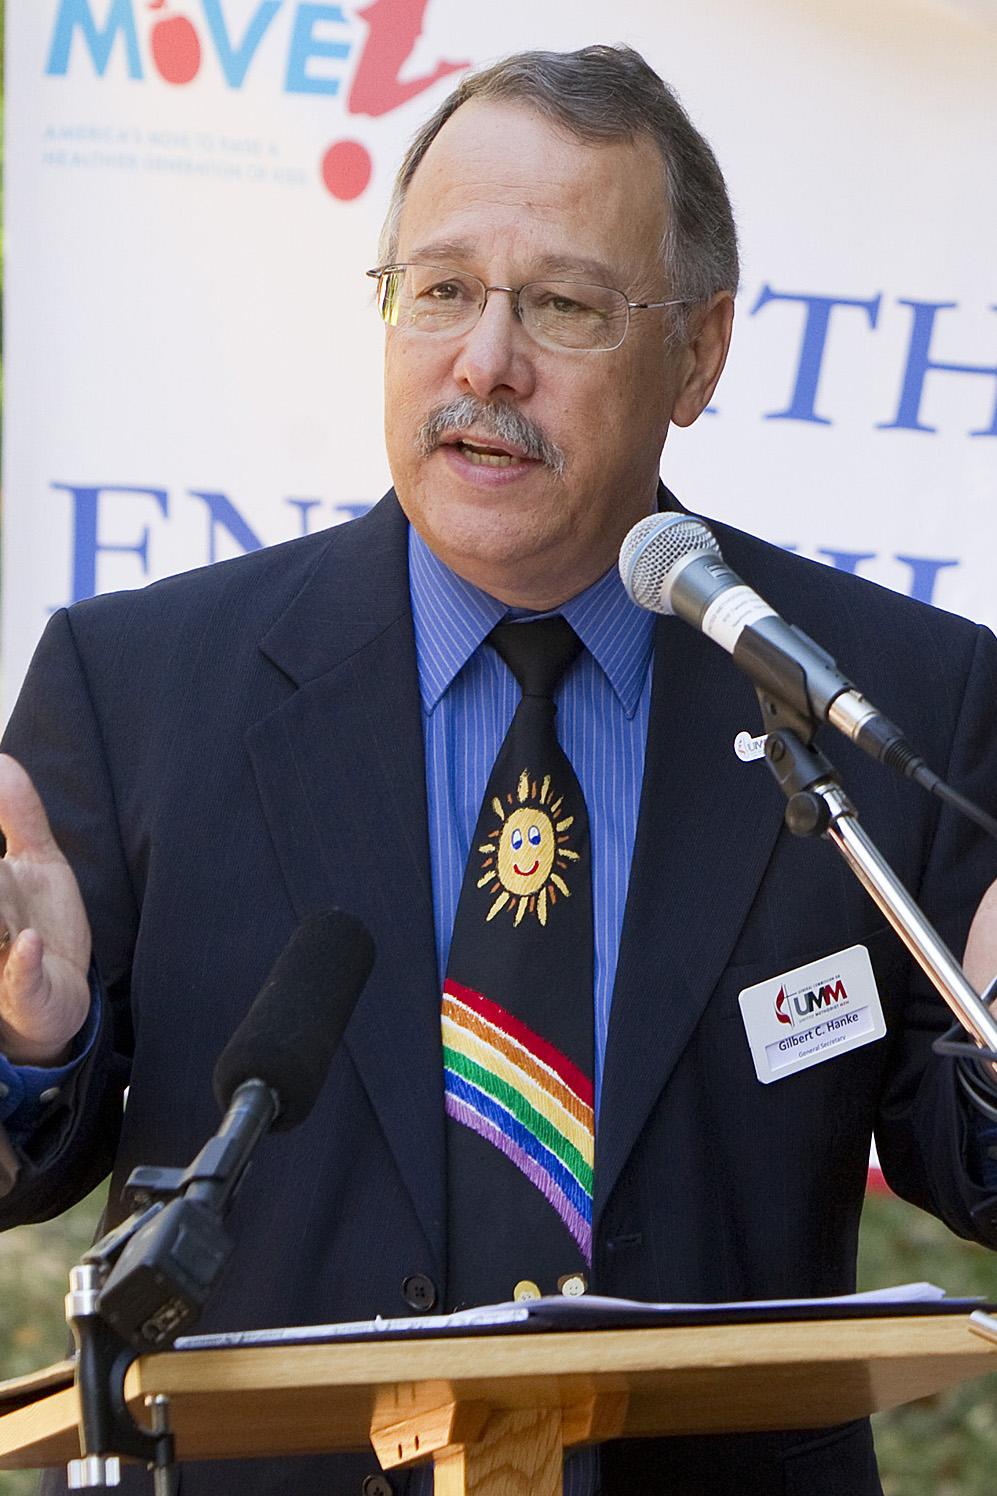 Gilbert Hanke, top staff executive of United Methodist Men. 2012 file photo by Mike DuBose, UMNS